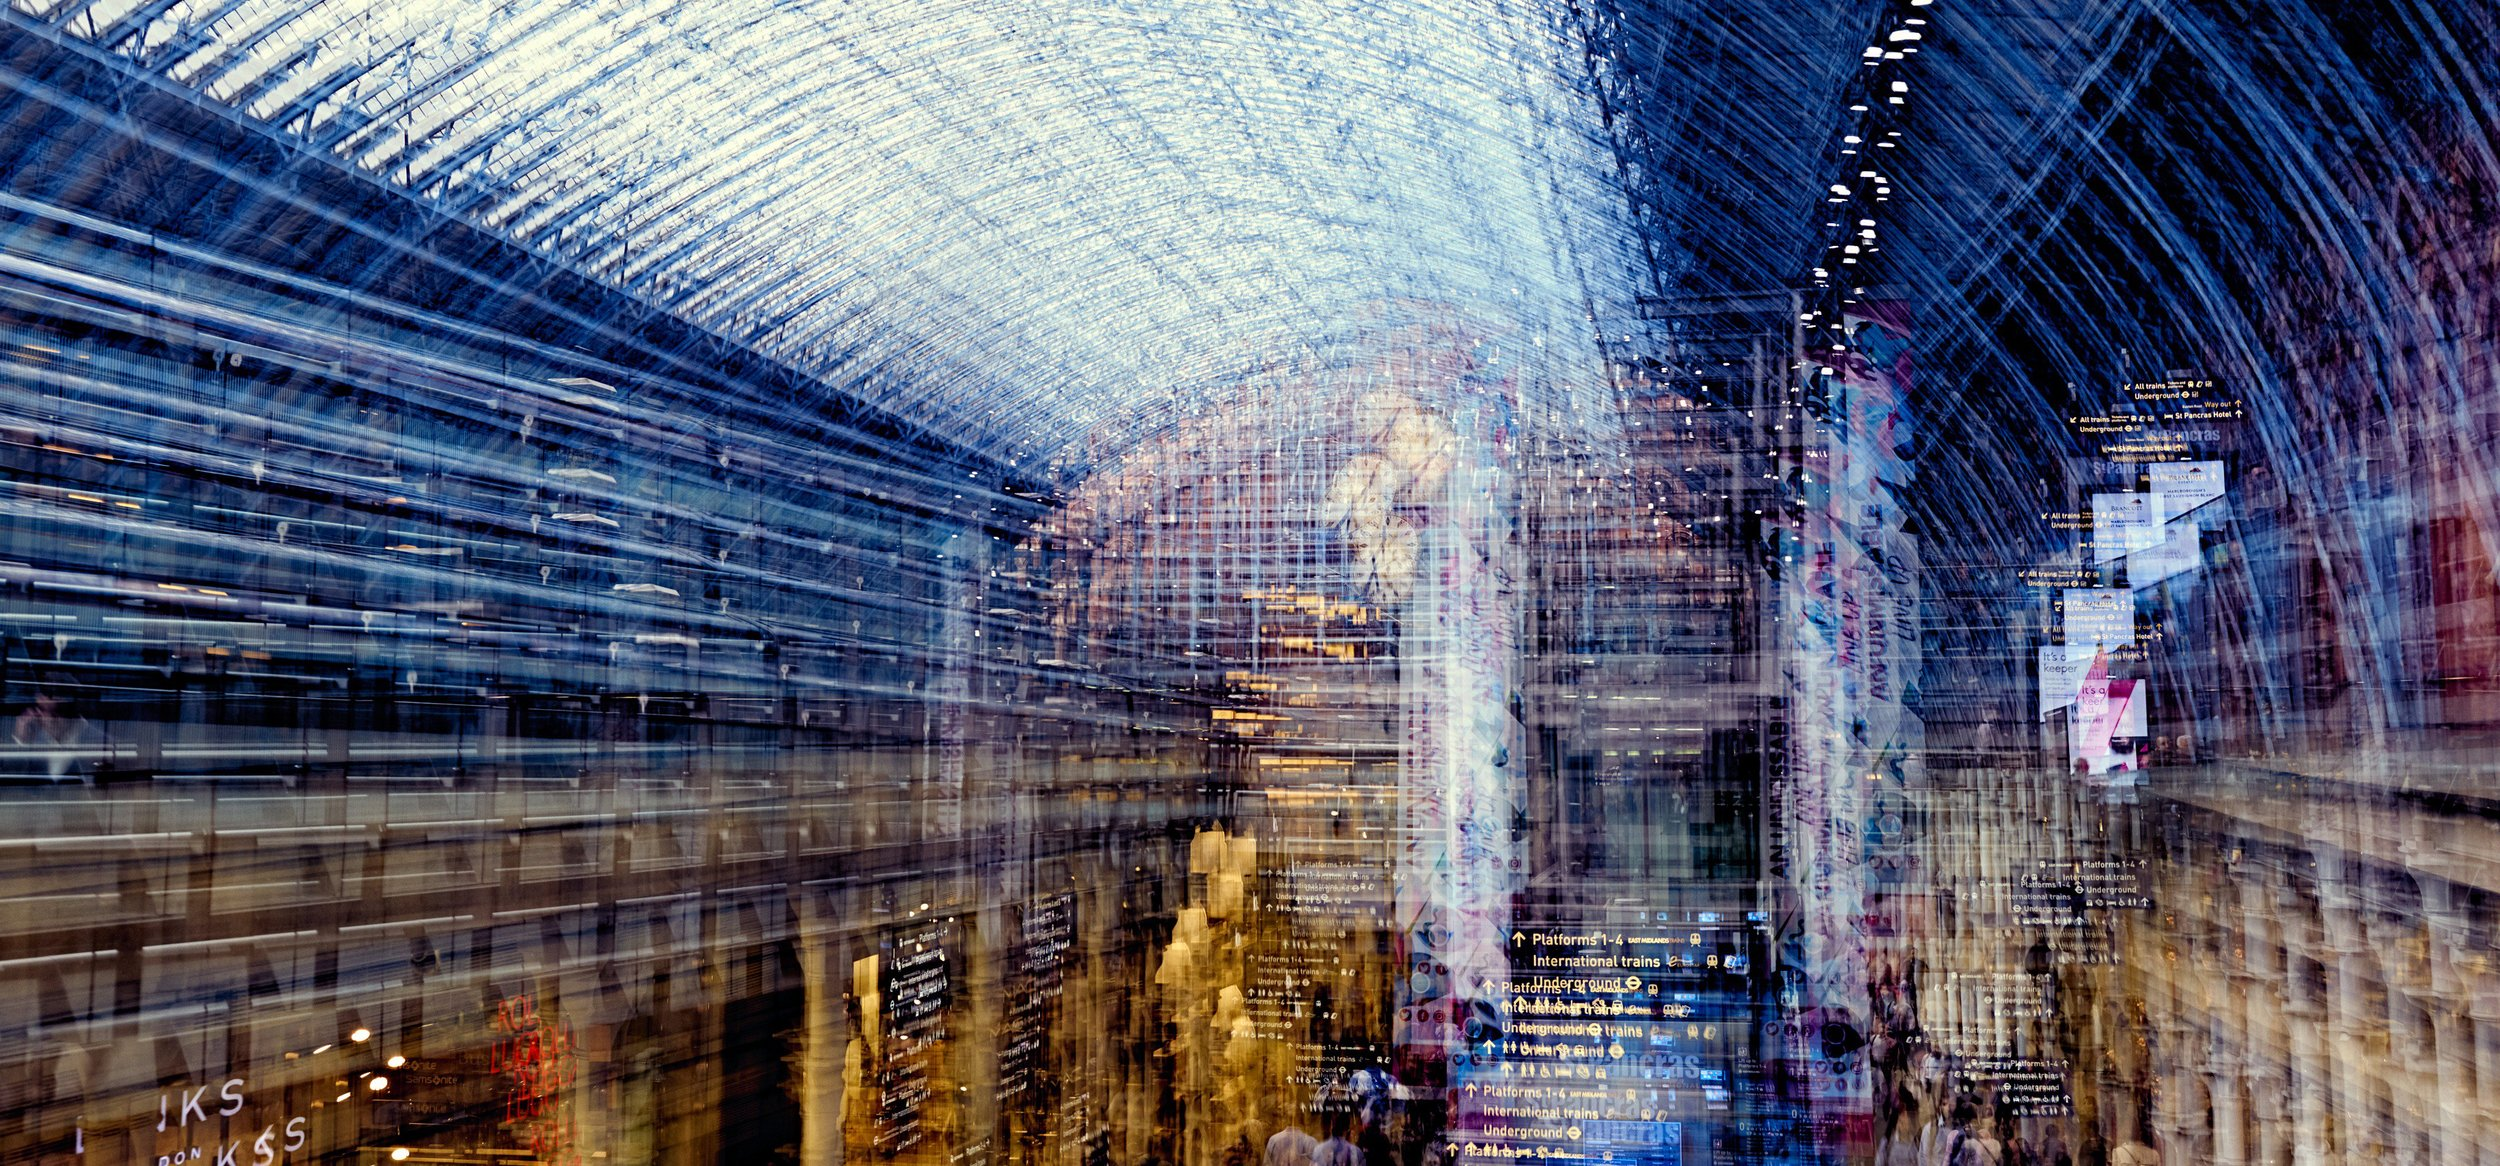 St Pancras multiple exposure - Darren Rose